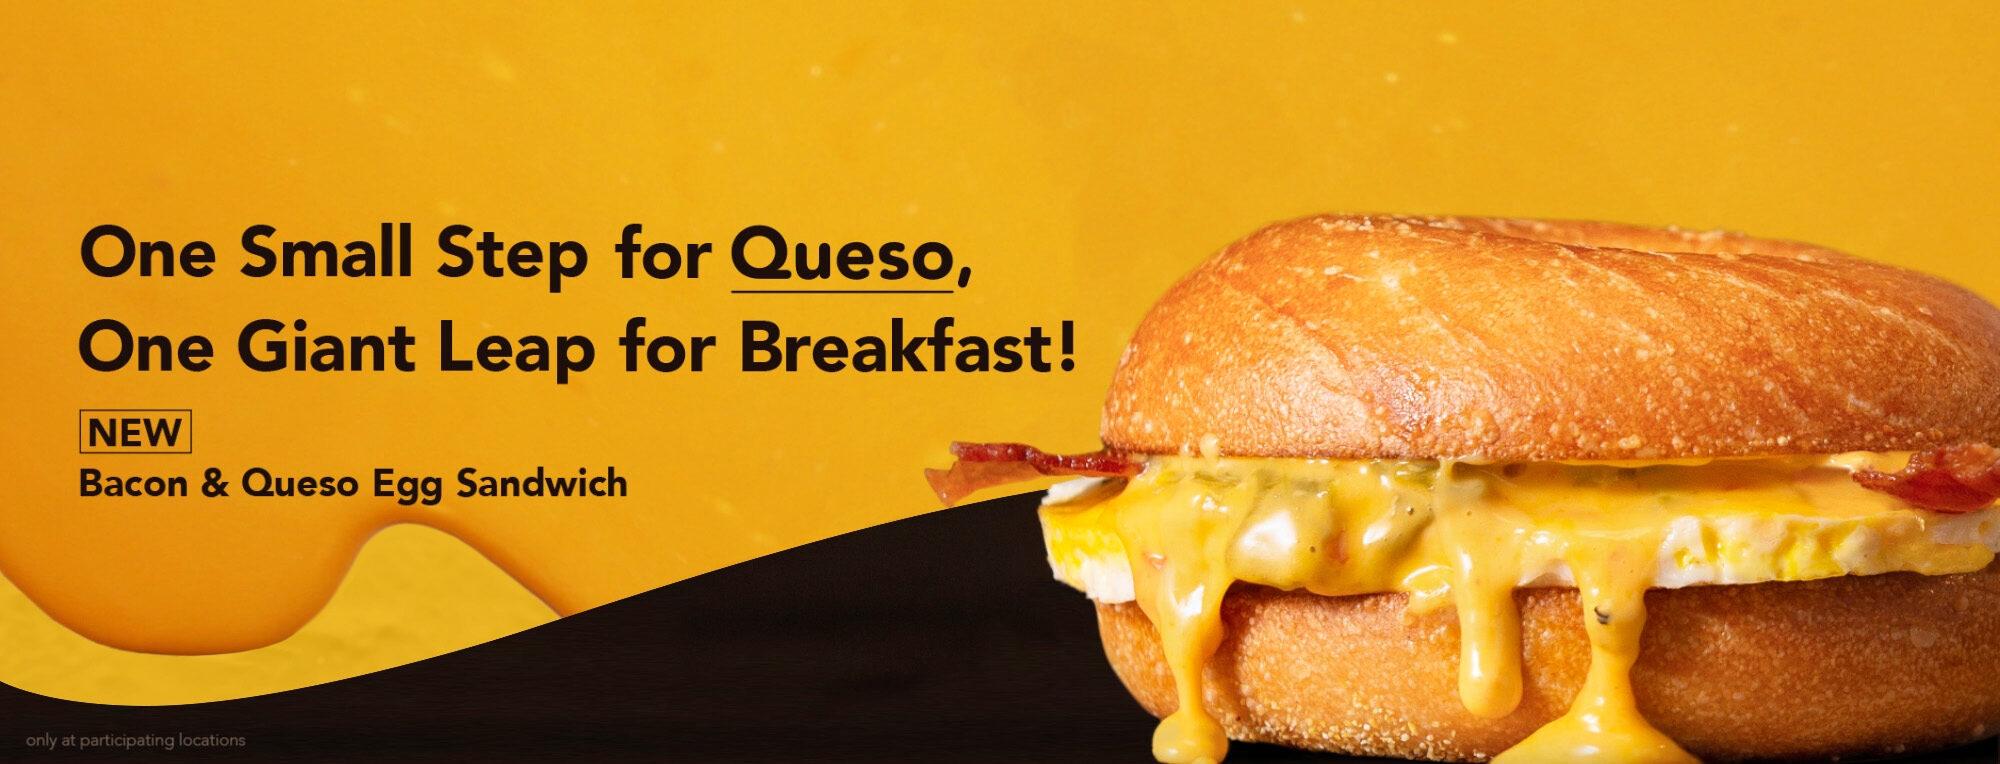 Bacon and Queso Egg Sandwich Einstein Bros. Bagels Web Slider